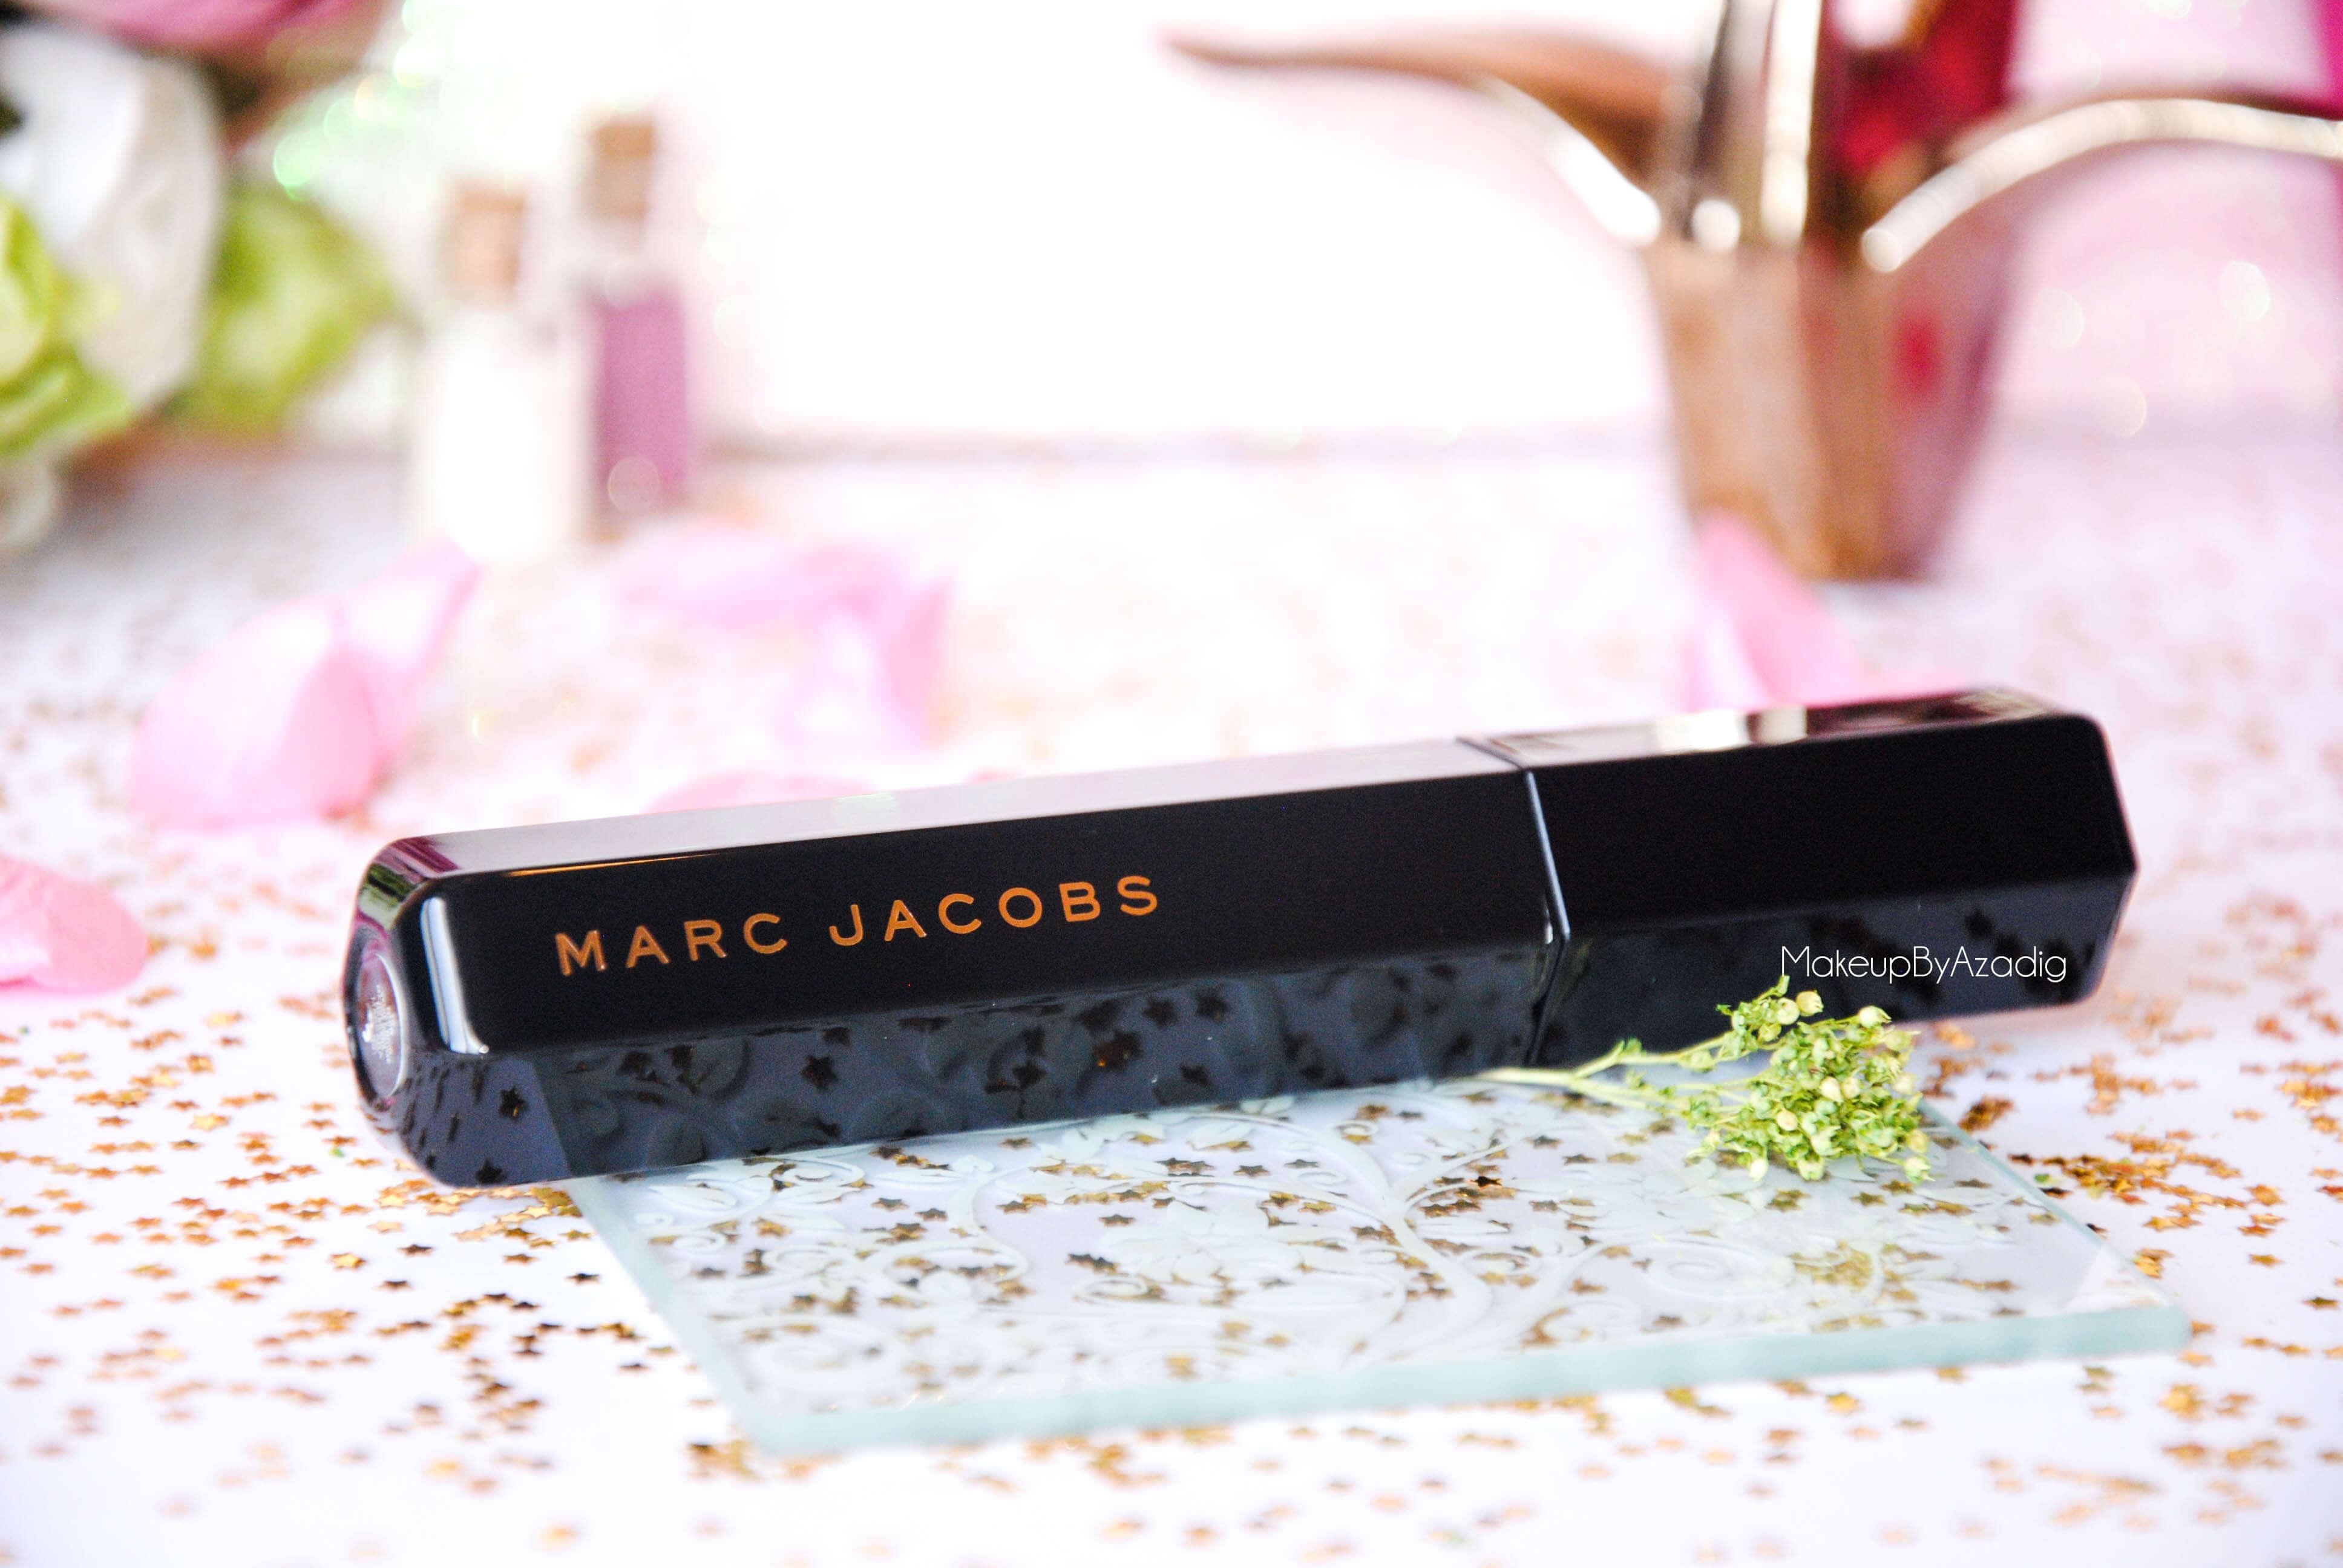 velvet noir-volume spectaculaire-marc jacobs-makeupbyazadig-revue-review-mascara-noir intense